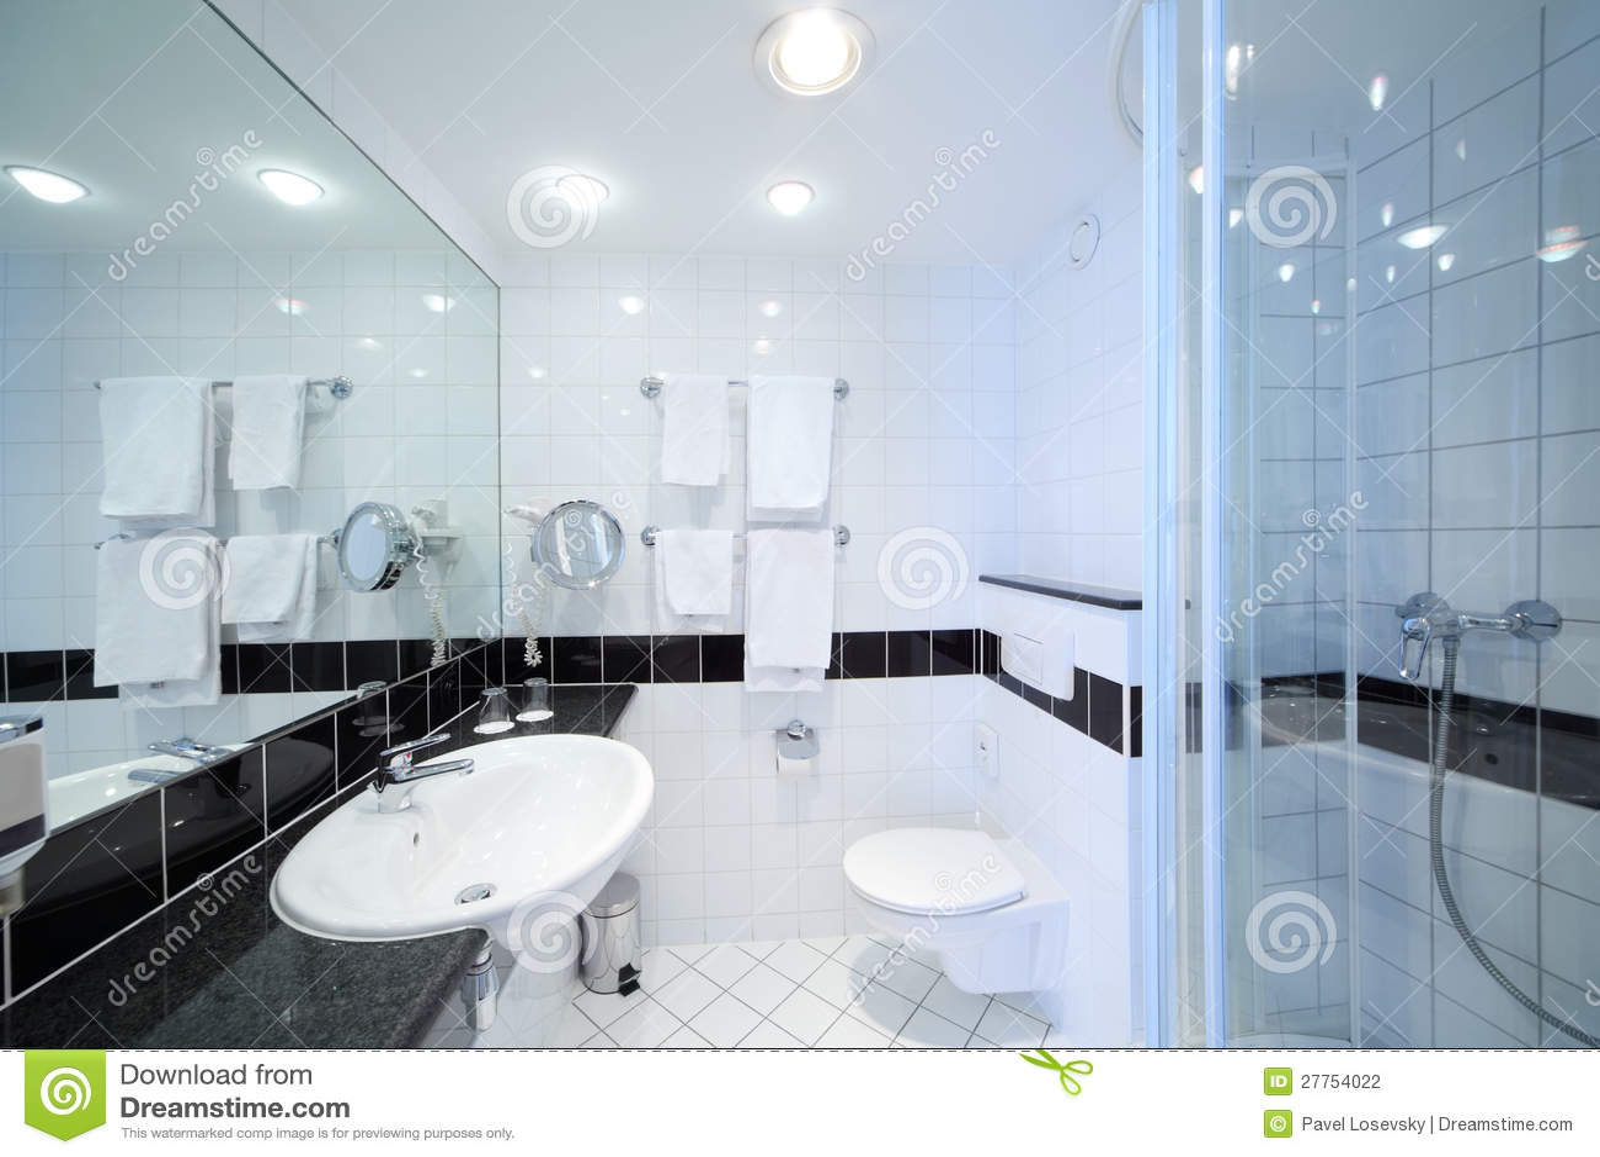 Salle de bains moderne élégante